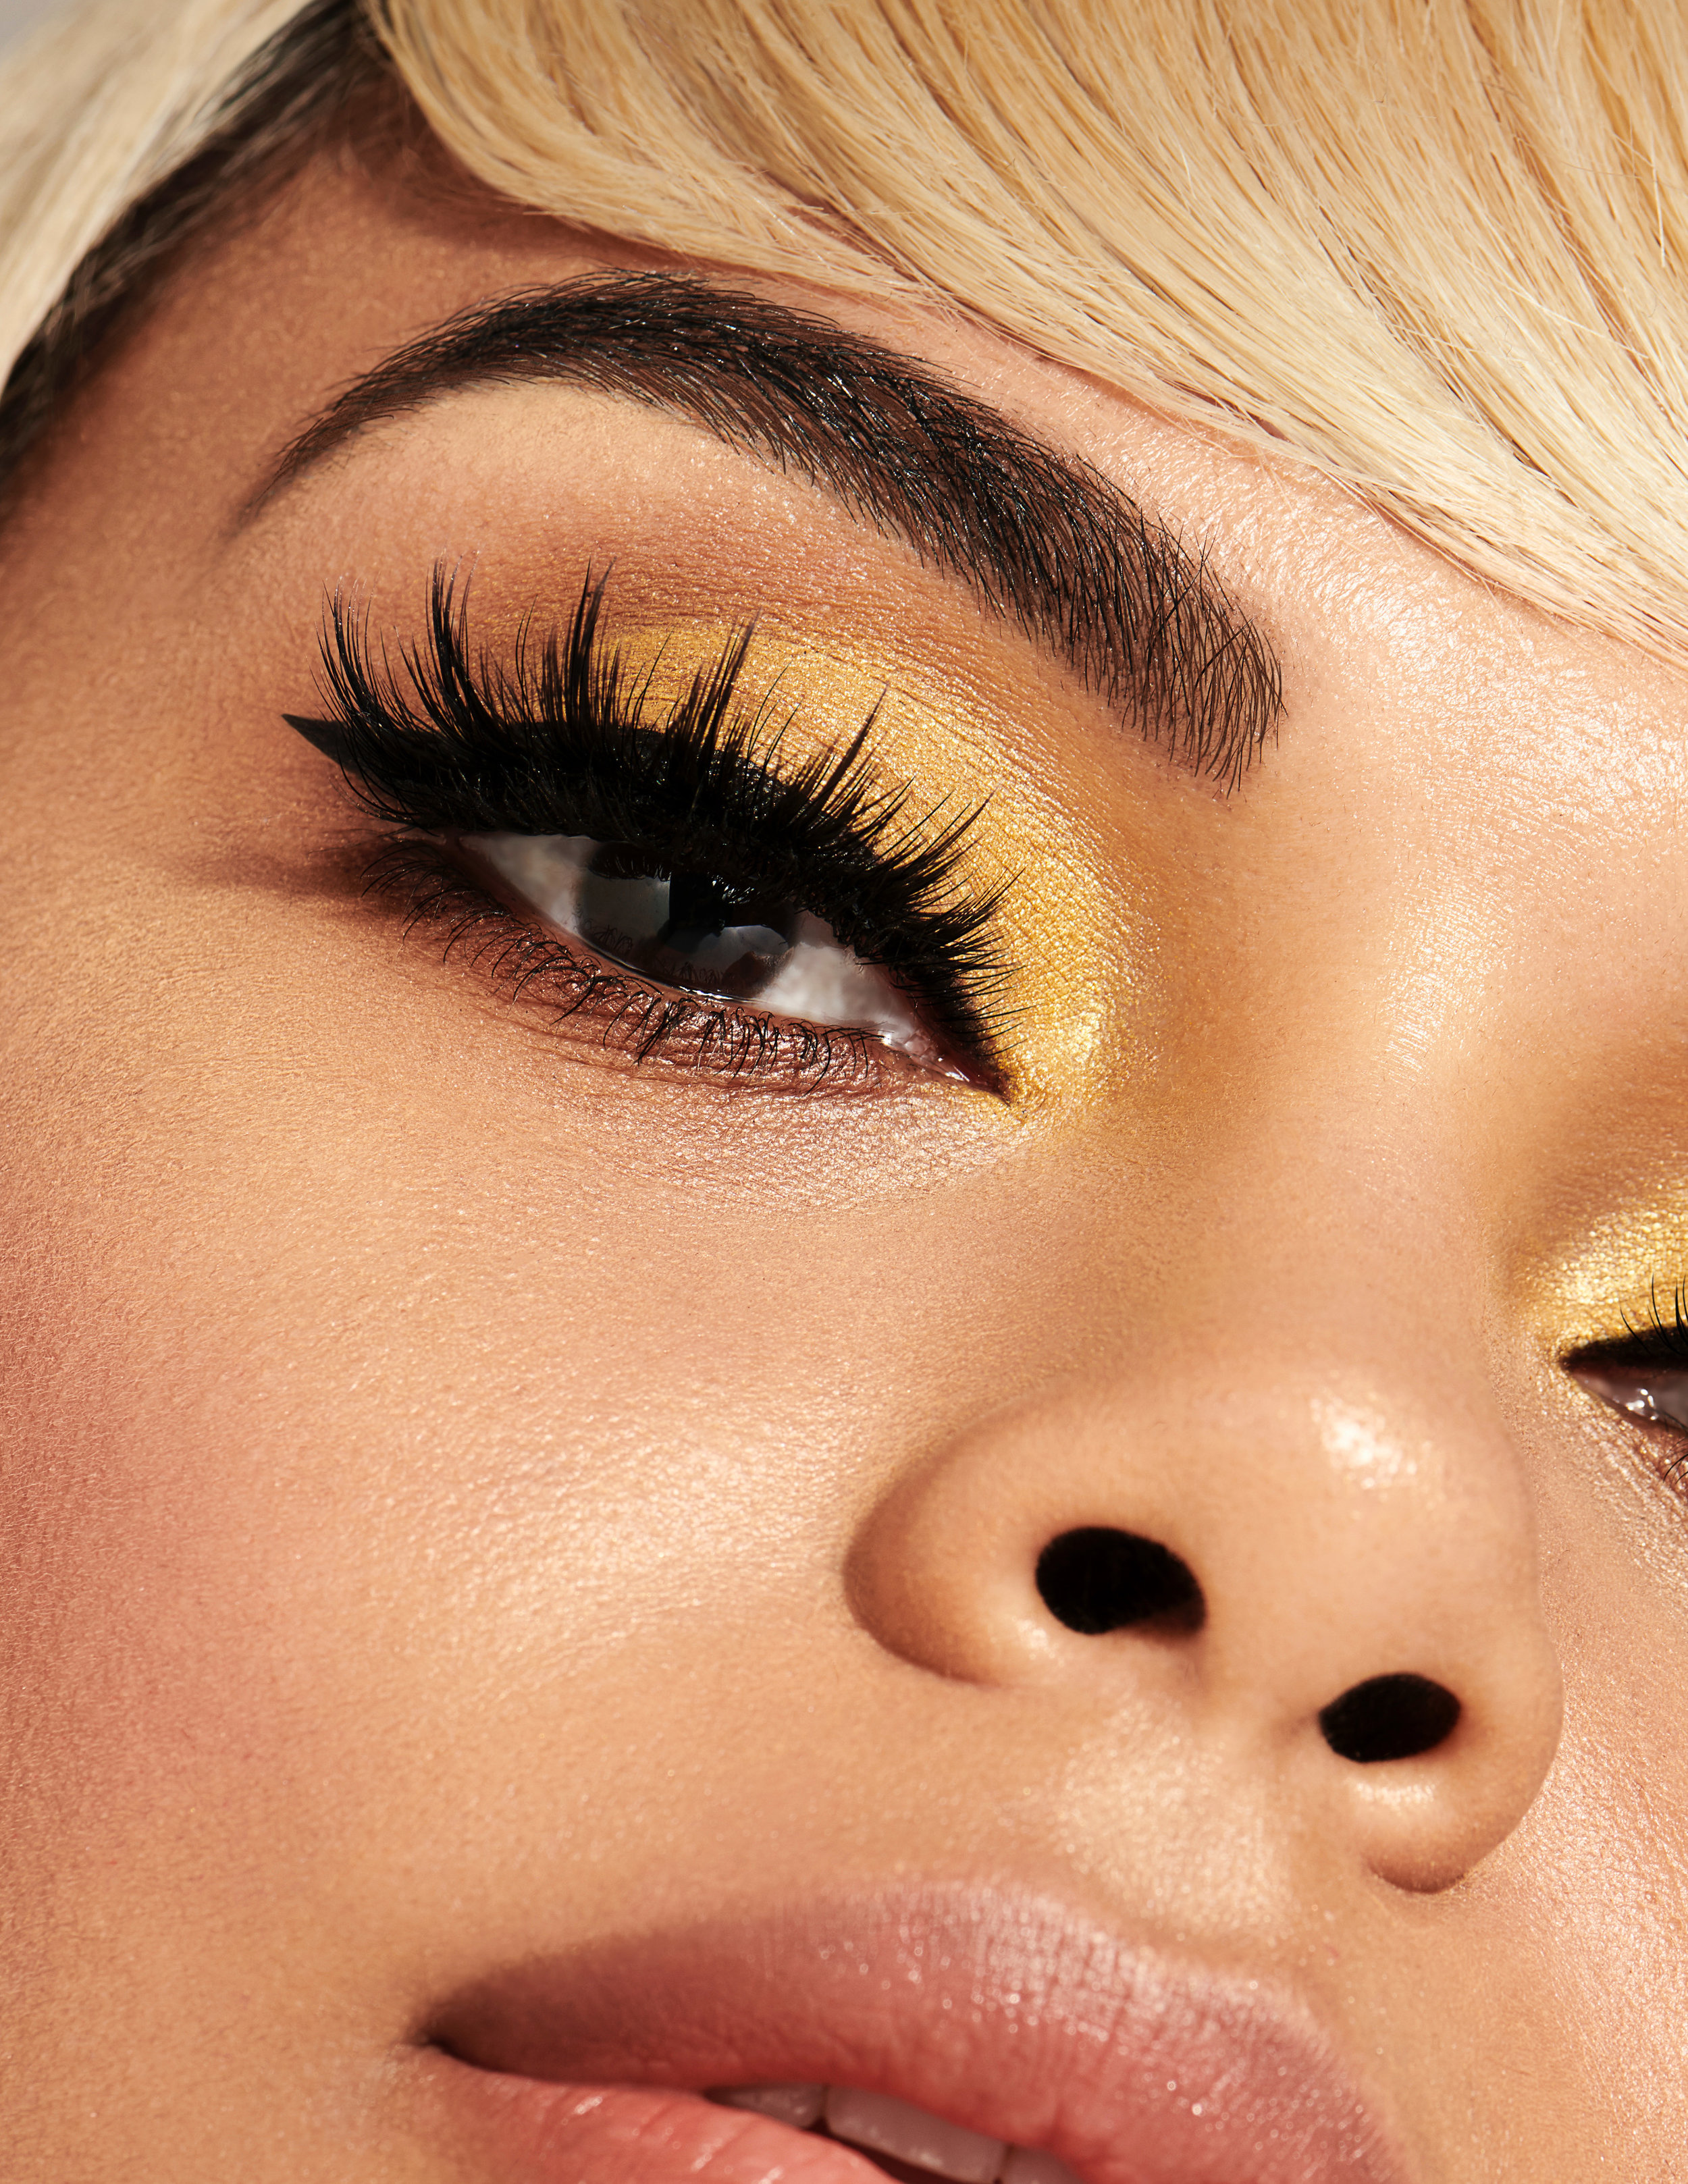 CoverGirl_YellowShadowMacro_0488_retouched.jpeg